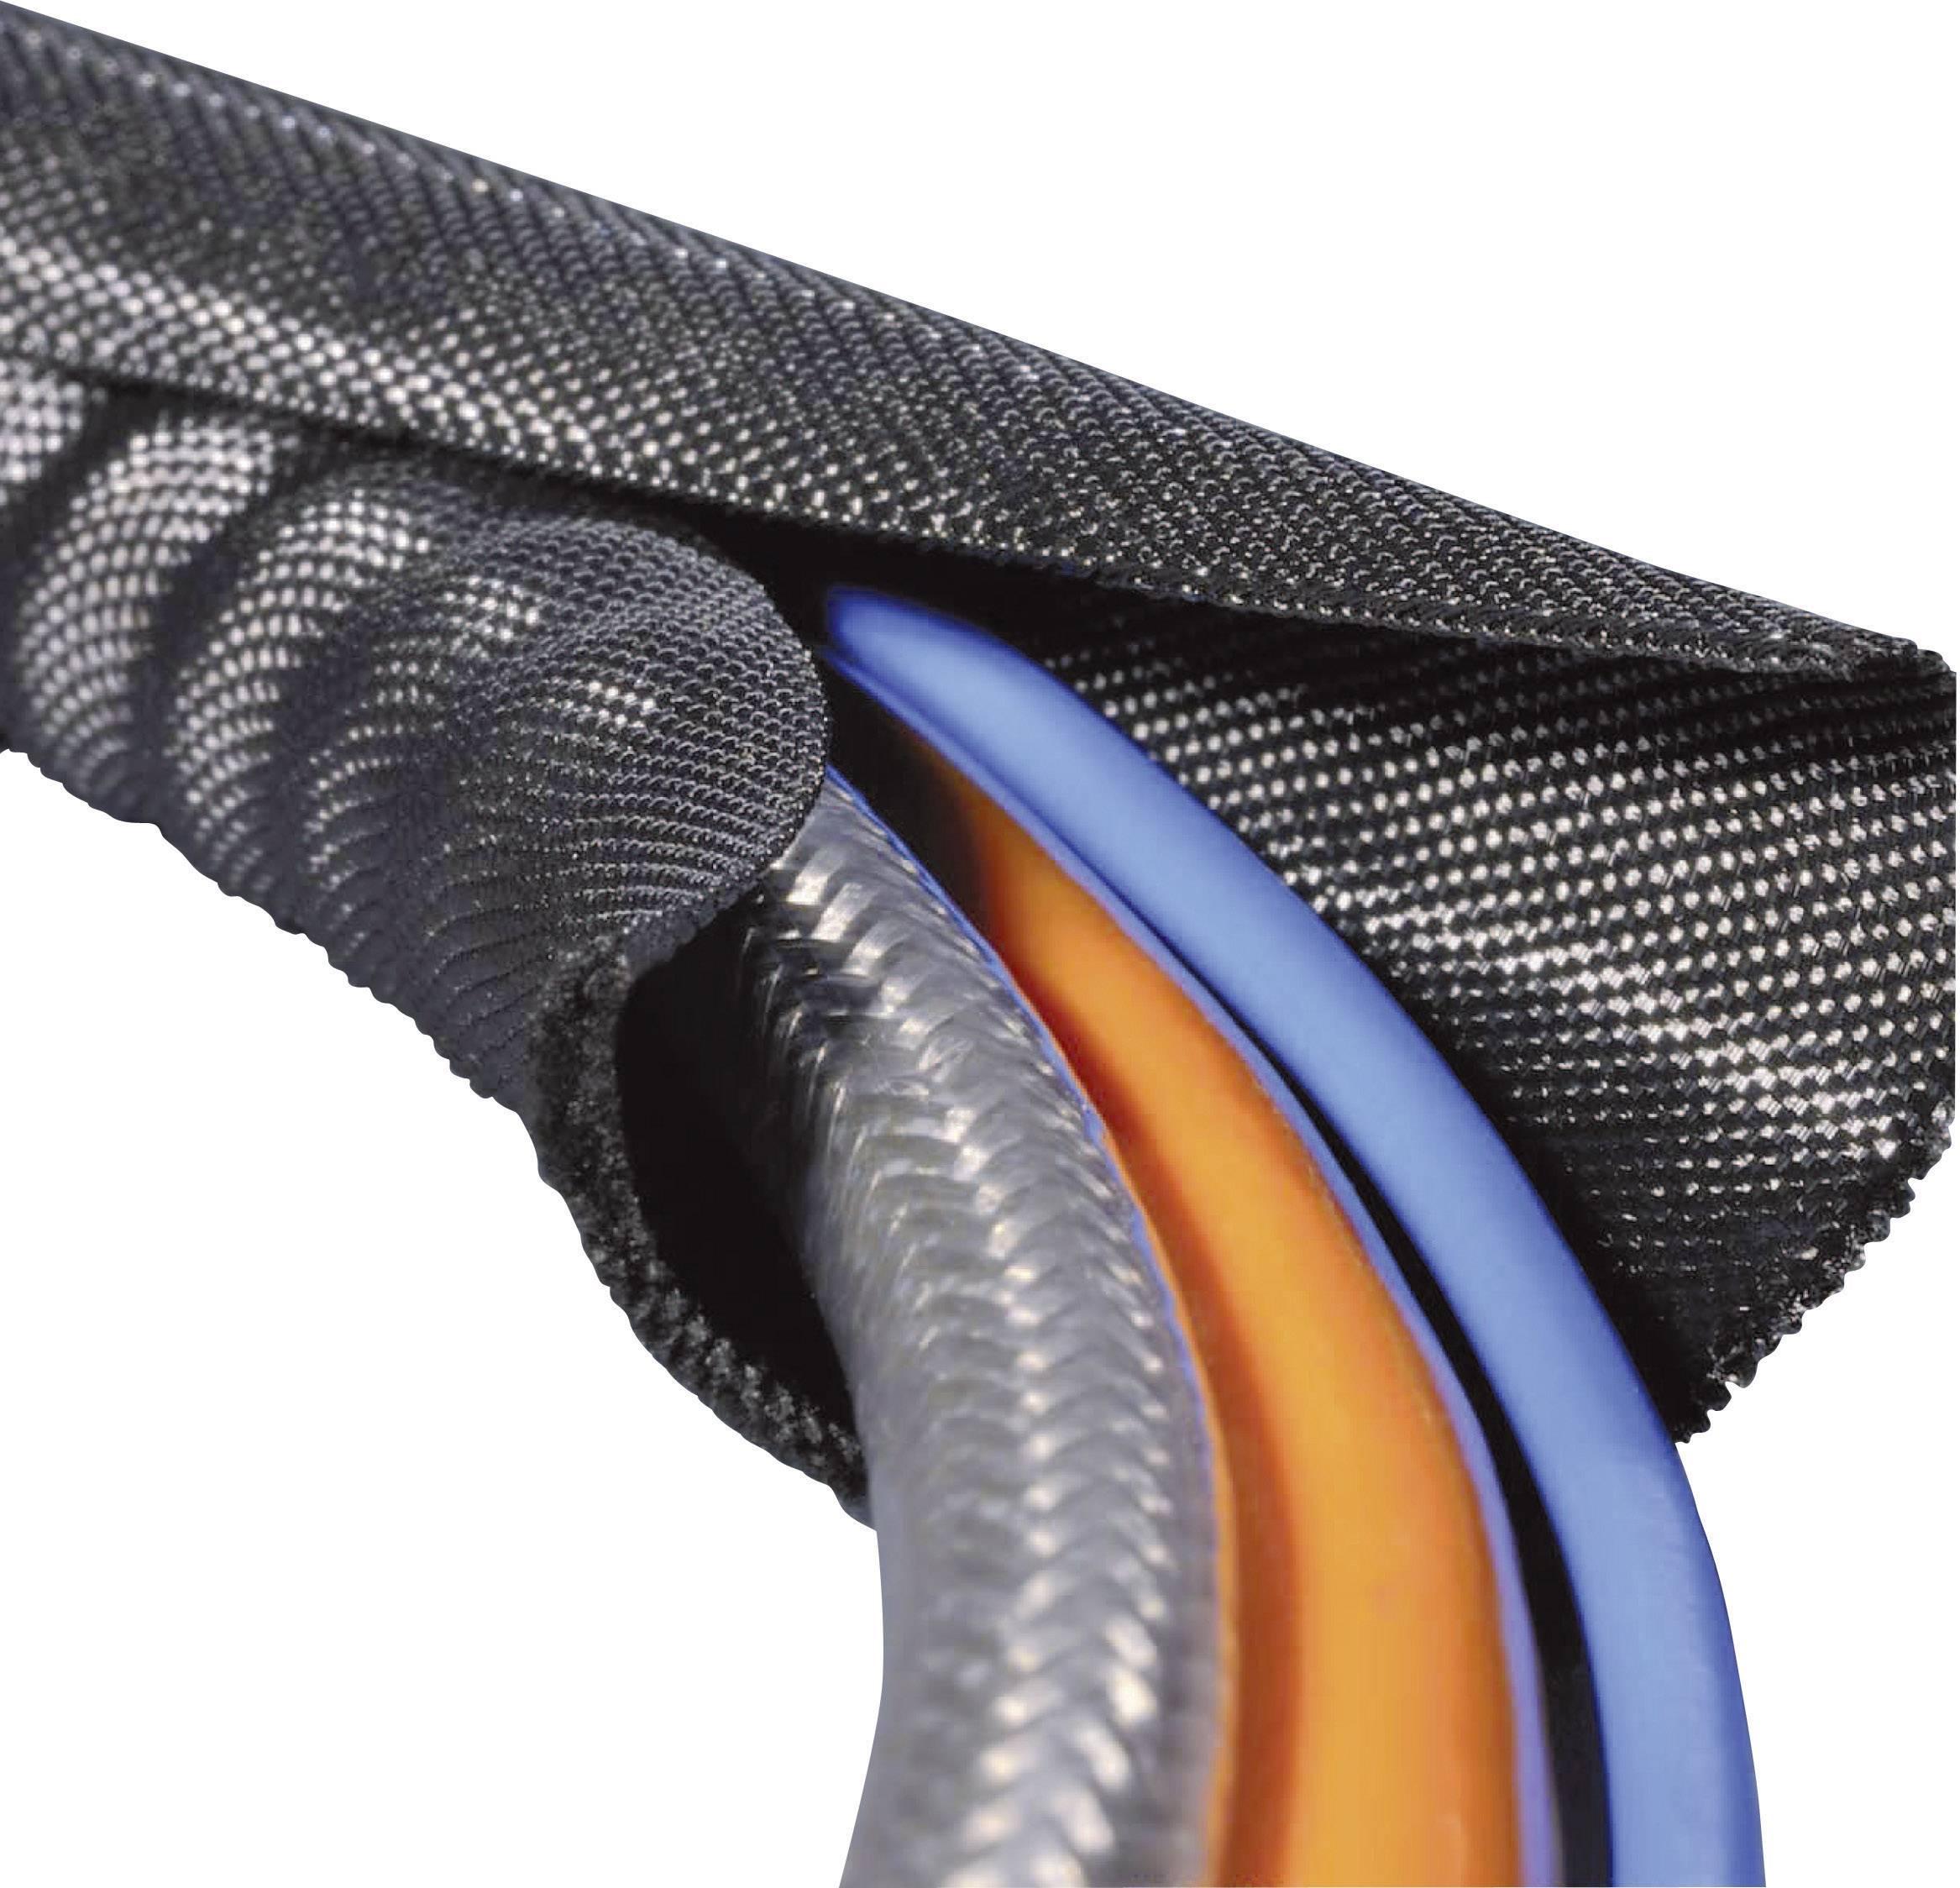 Ochranný oplet HellermannTyton Twist-In 05 (170-01000), 5 mm, černá